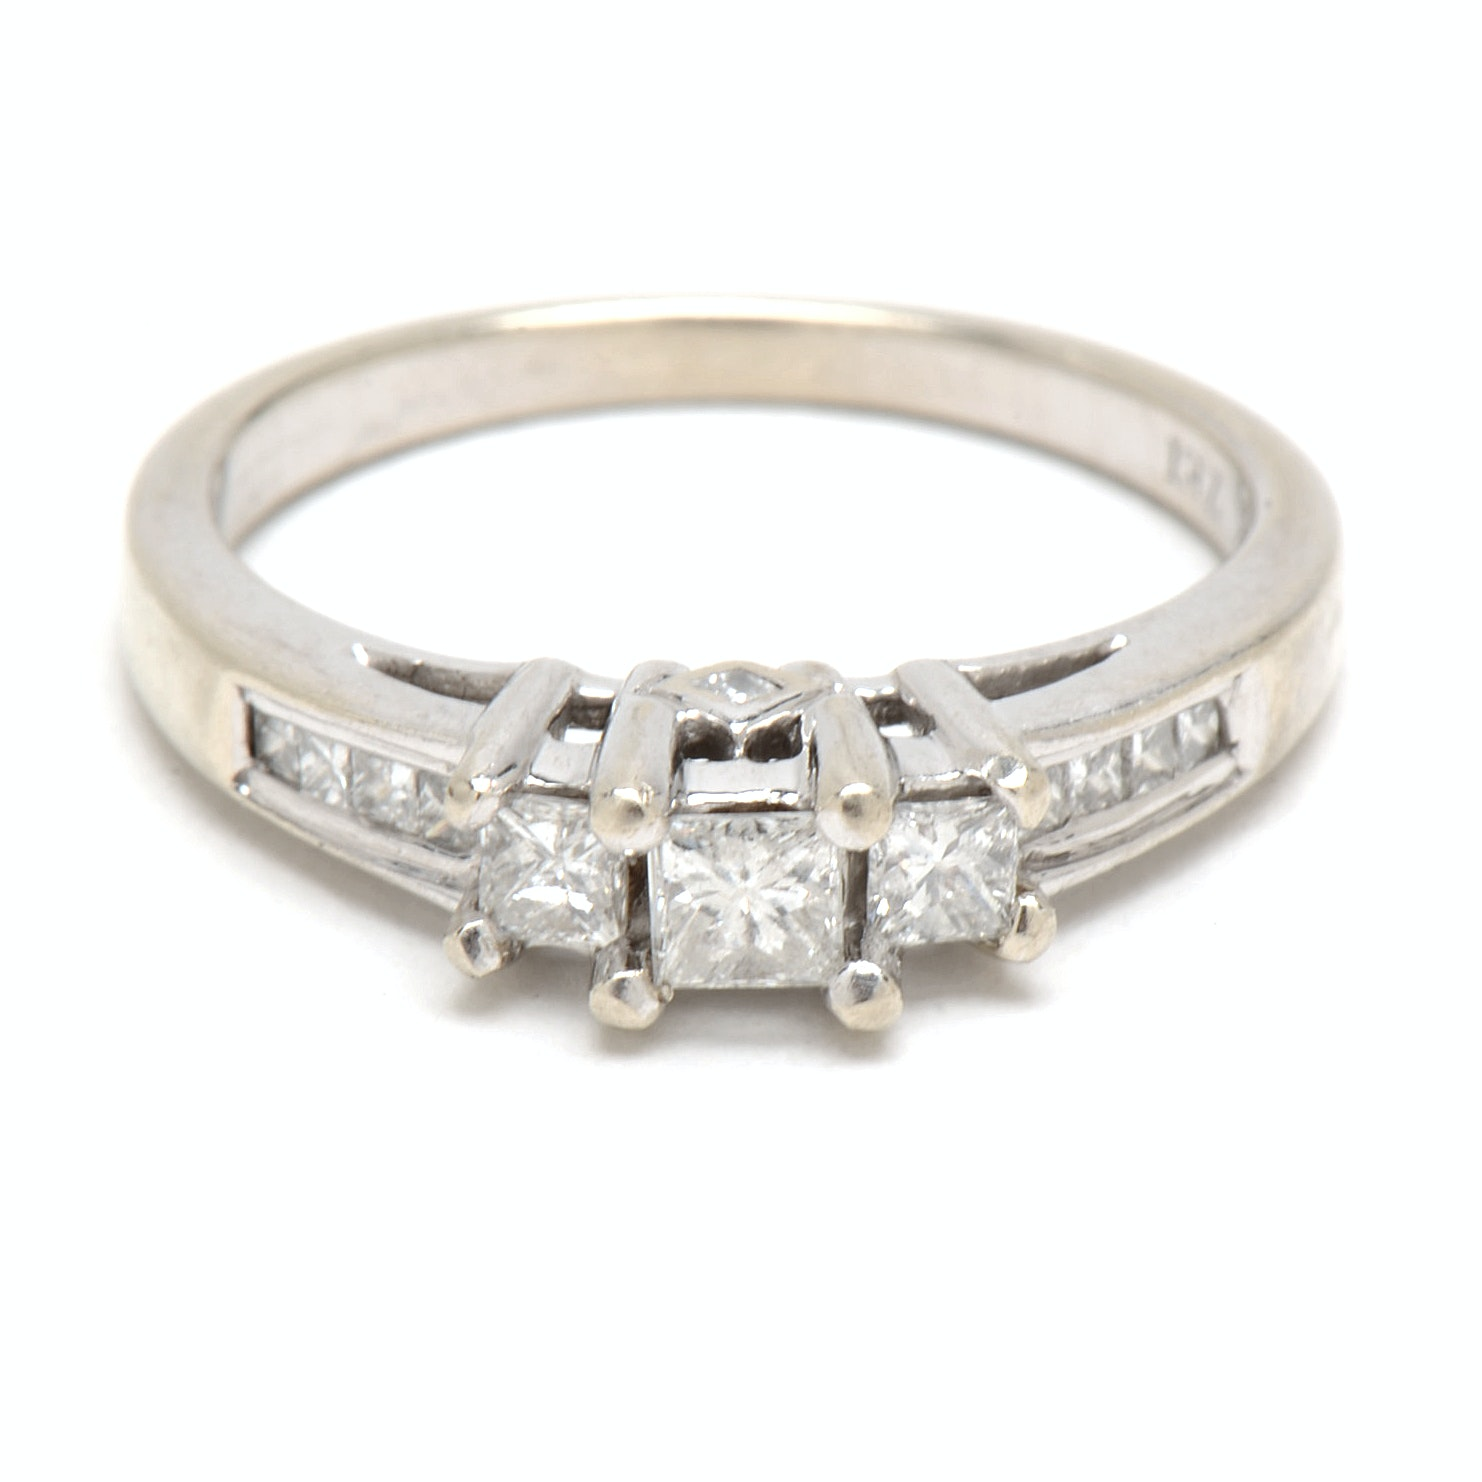 14K White Gold Princess-Cut Diamond Engagement Ring